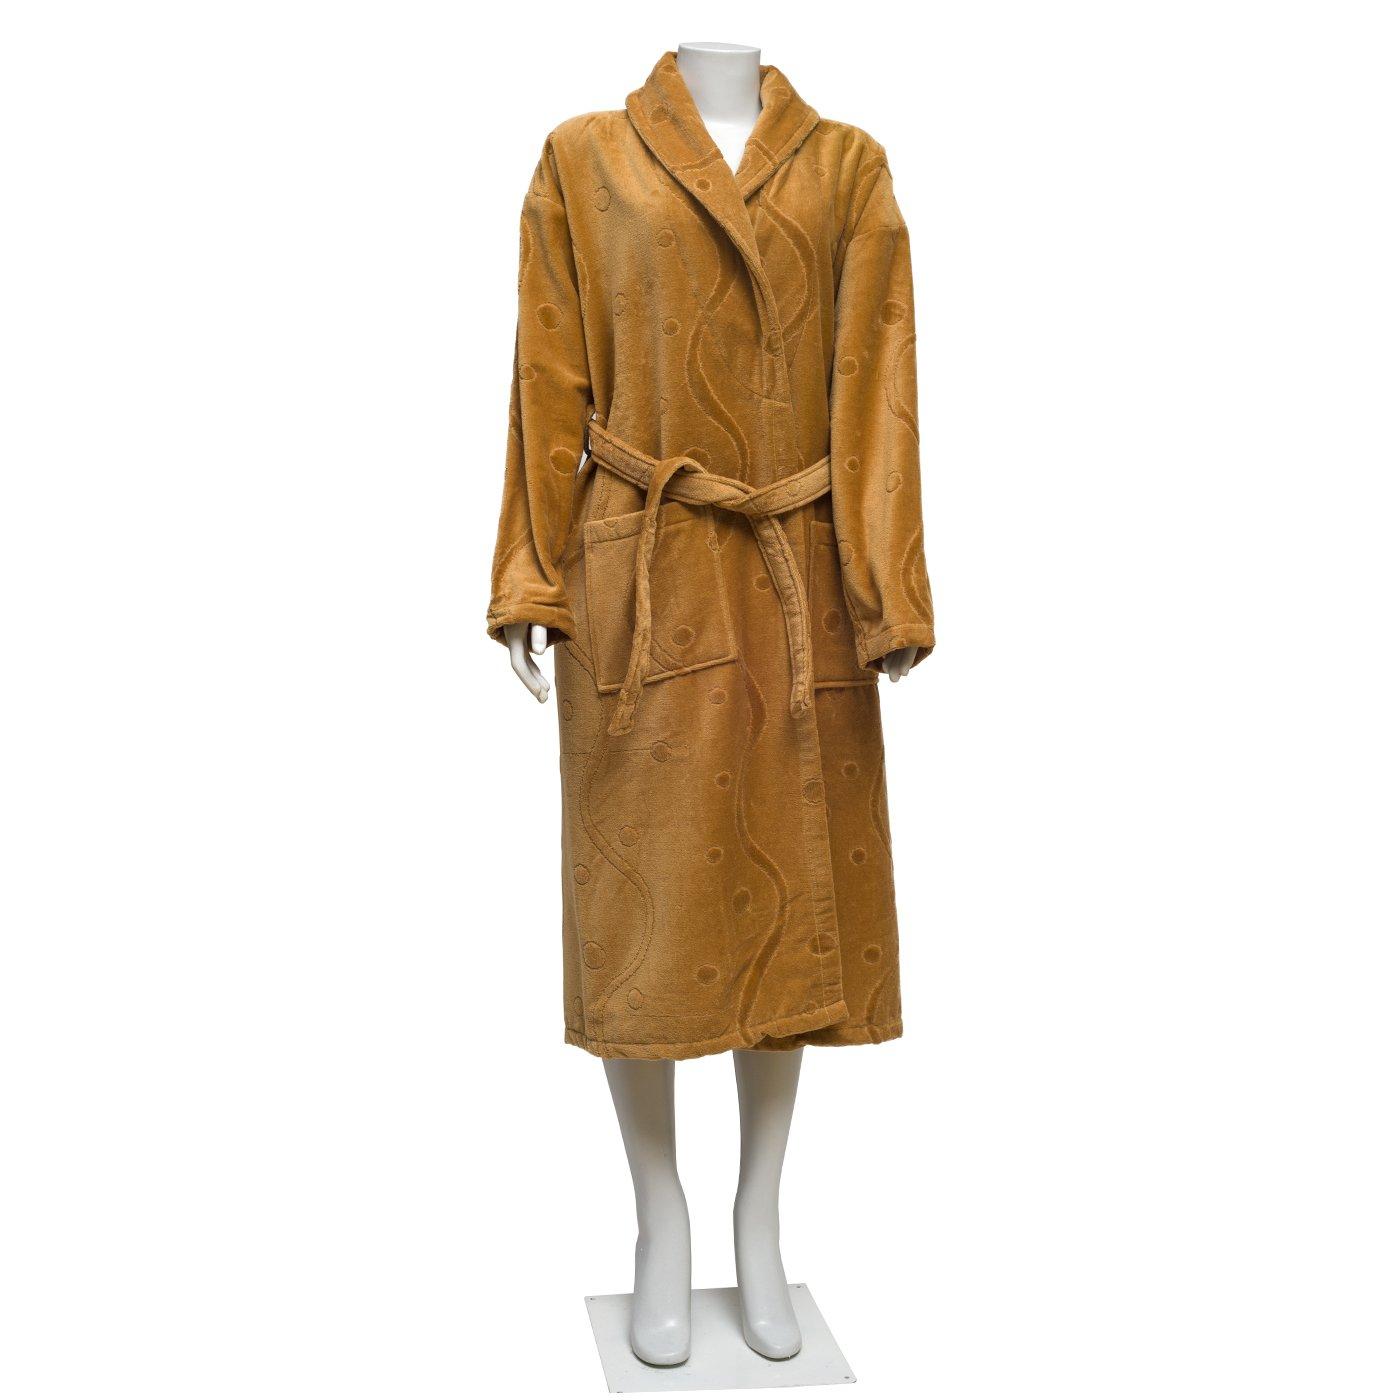 100% Turkish Cotton Velvet Extra Plush Bathrobe Set, Large Bath Towel, Hair Towel Unisex Terry Bathrobe Set - Moisture Wicking and Odor Resistant (Light Coffee)